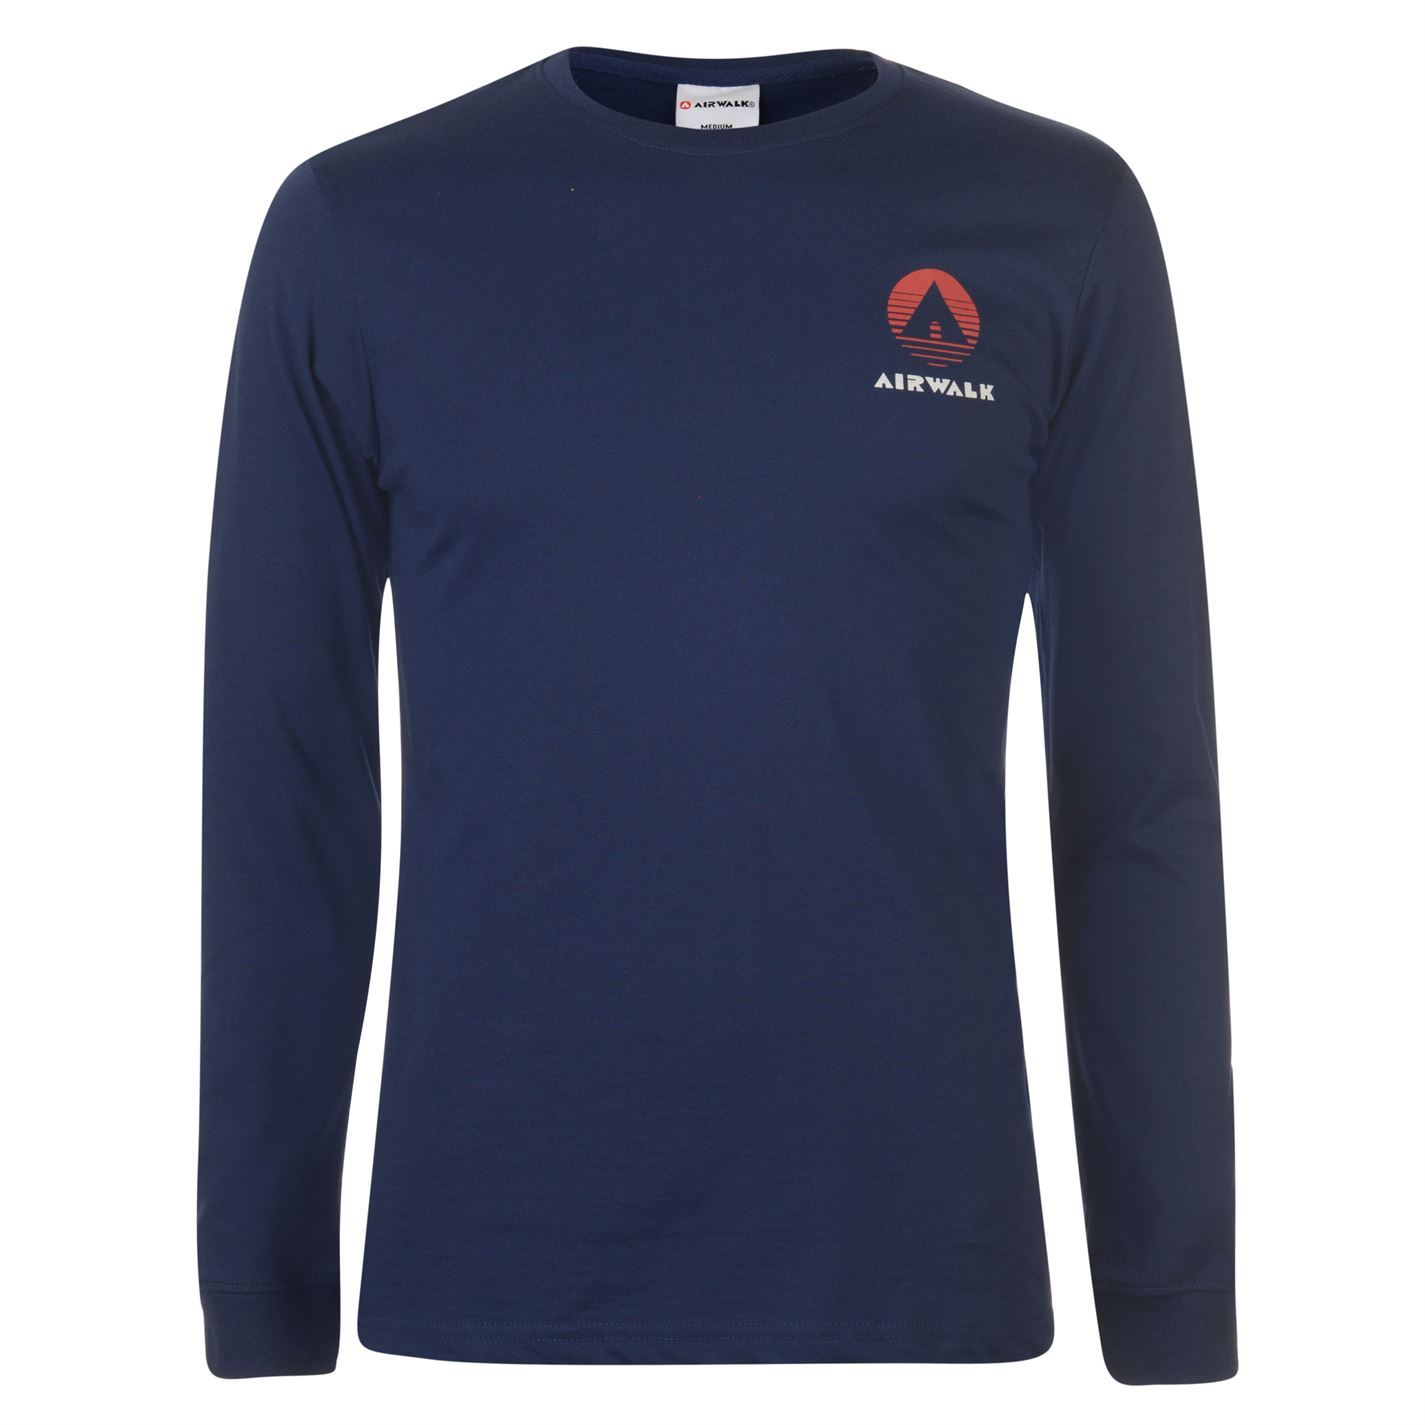 Airwalk Classic Long Sleeve T-Shirt Mens Skateboarding Top Tee Shirt Navy Small